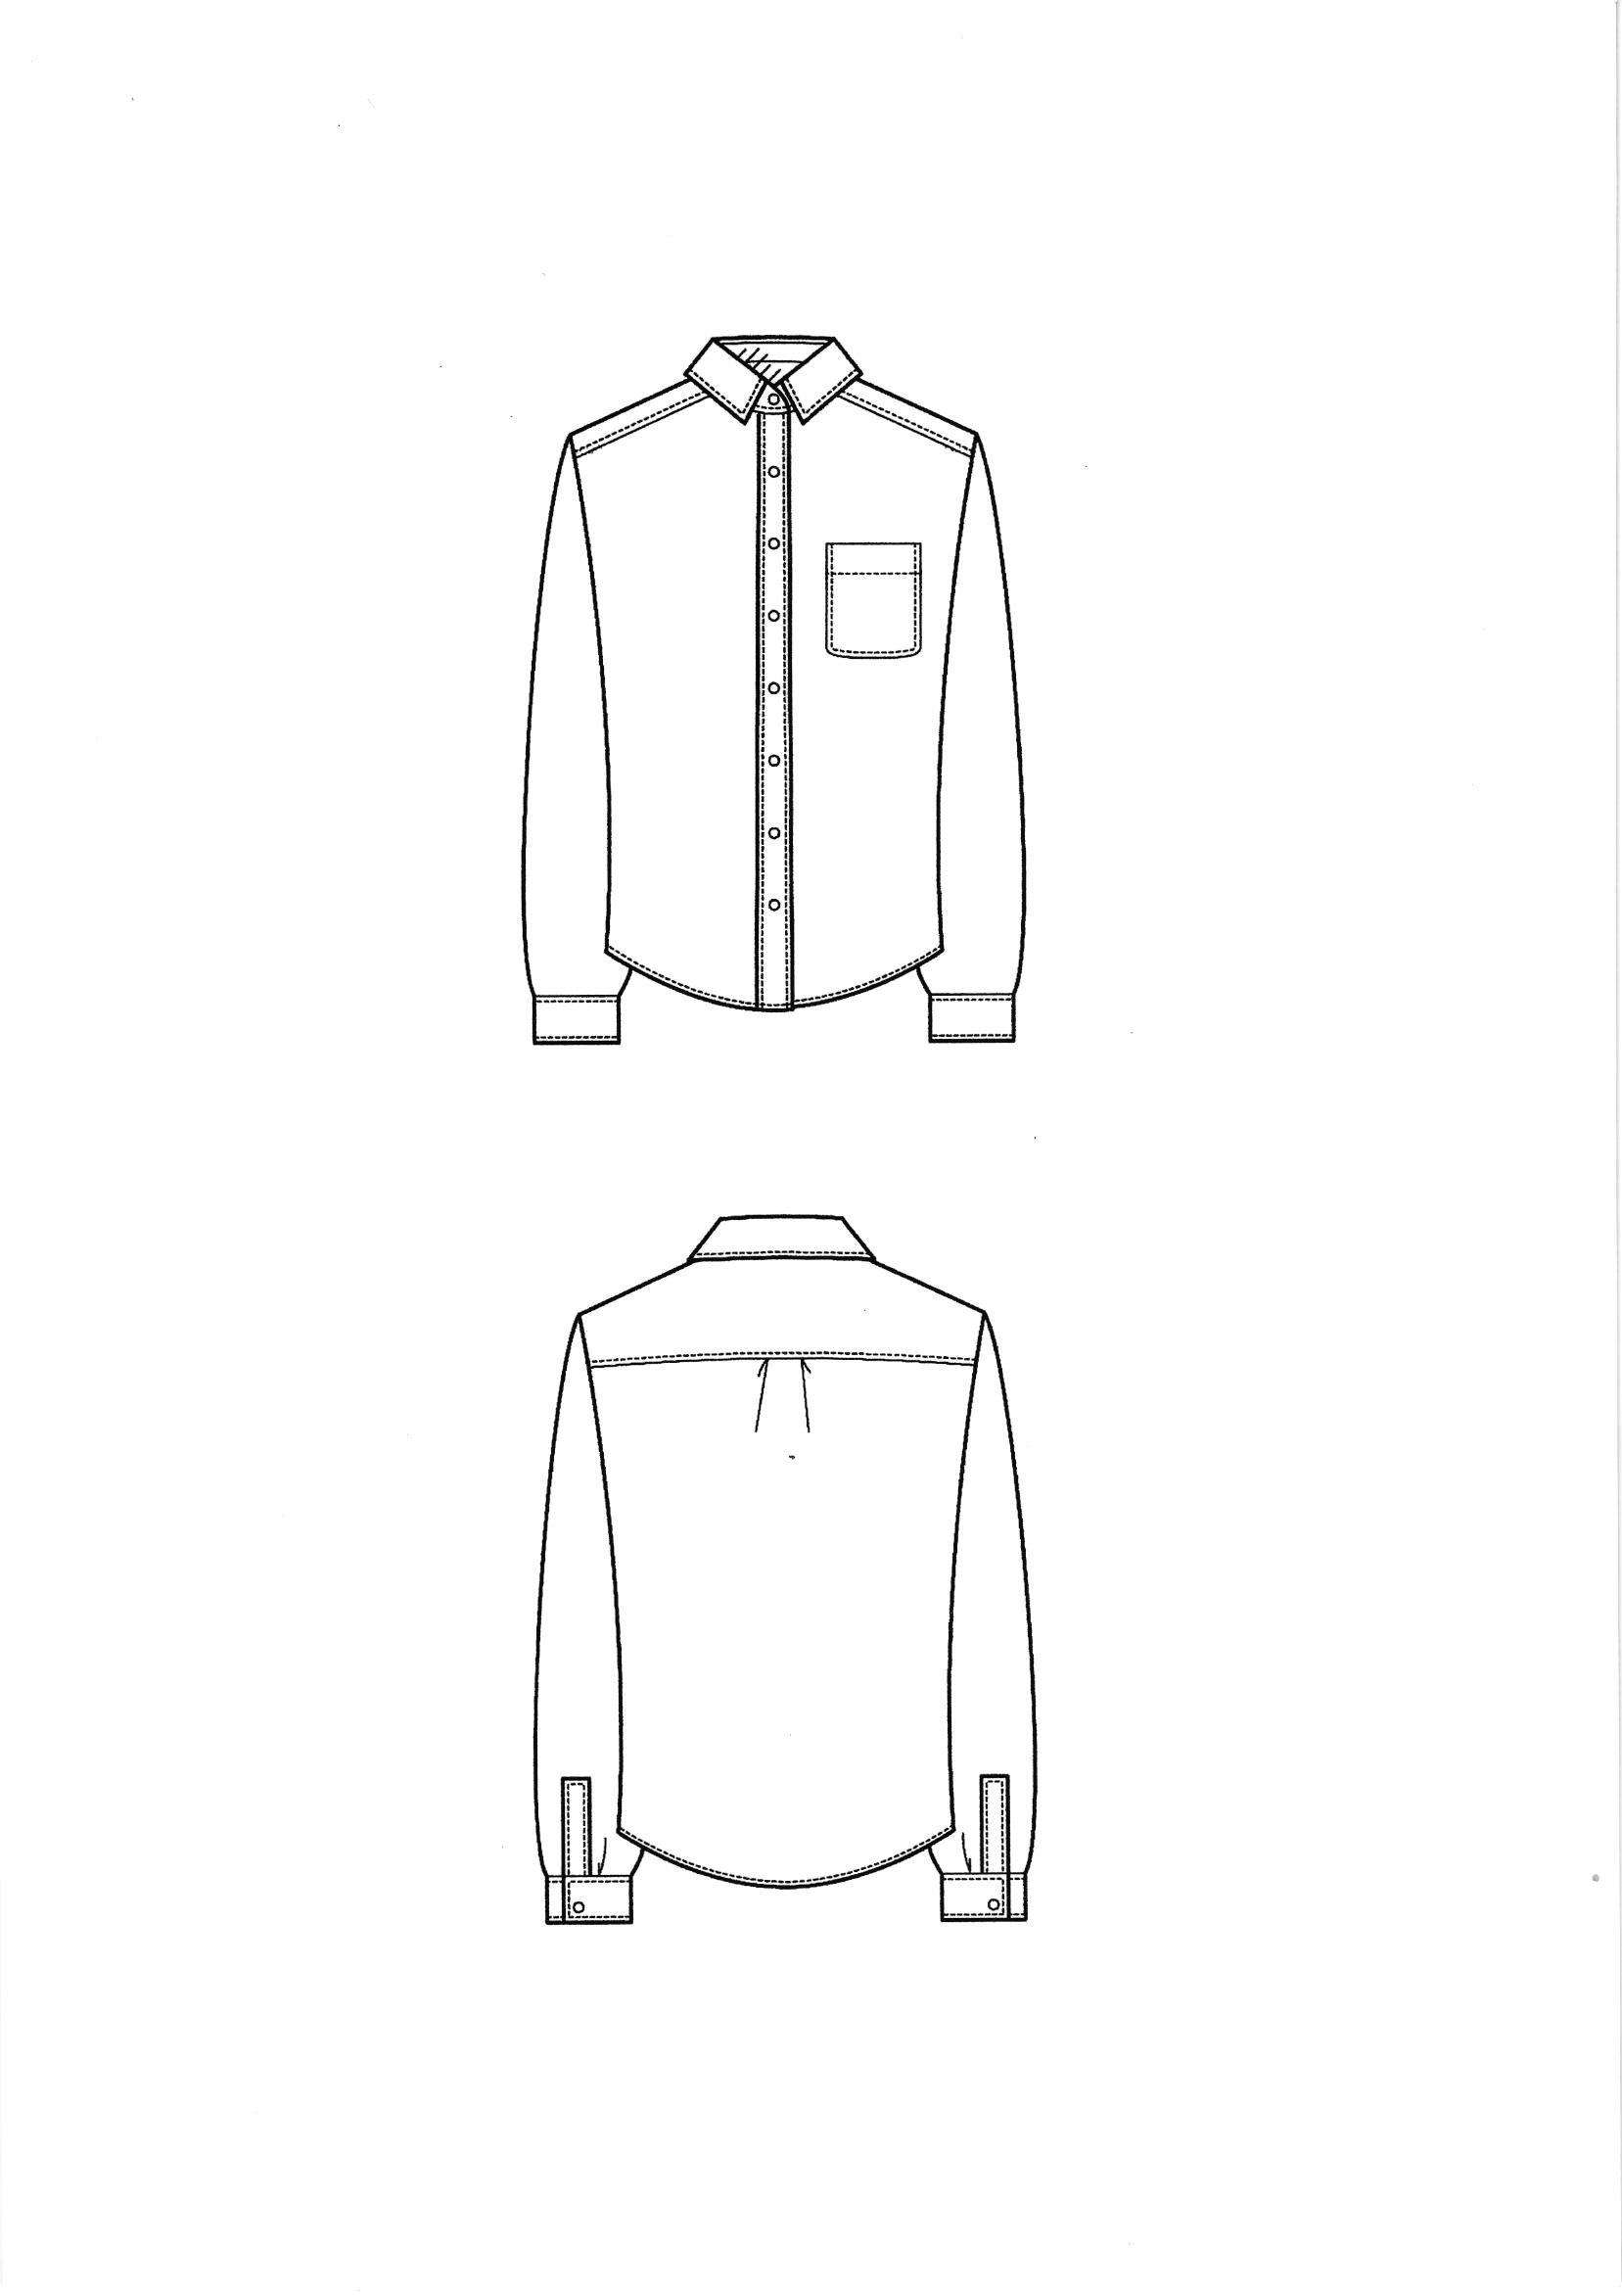 Shirt Collar Sketch At Paintingvalley